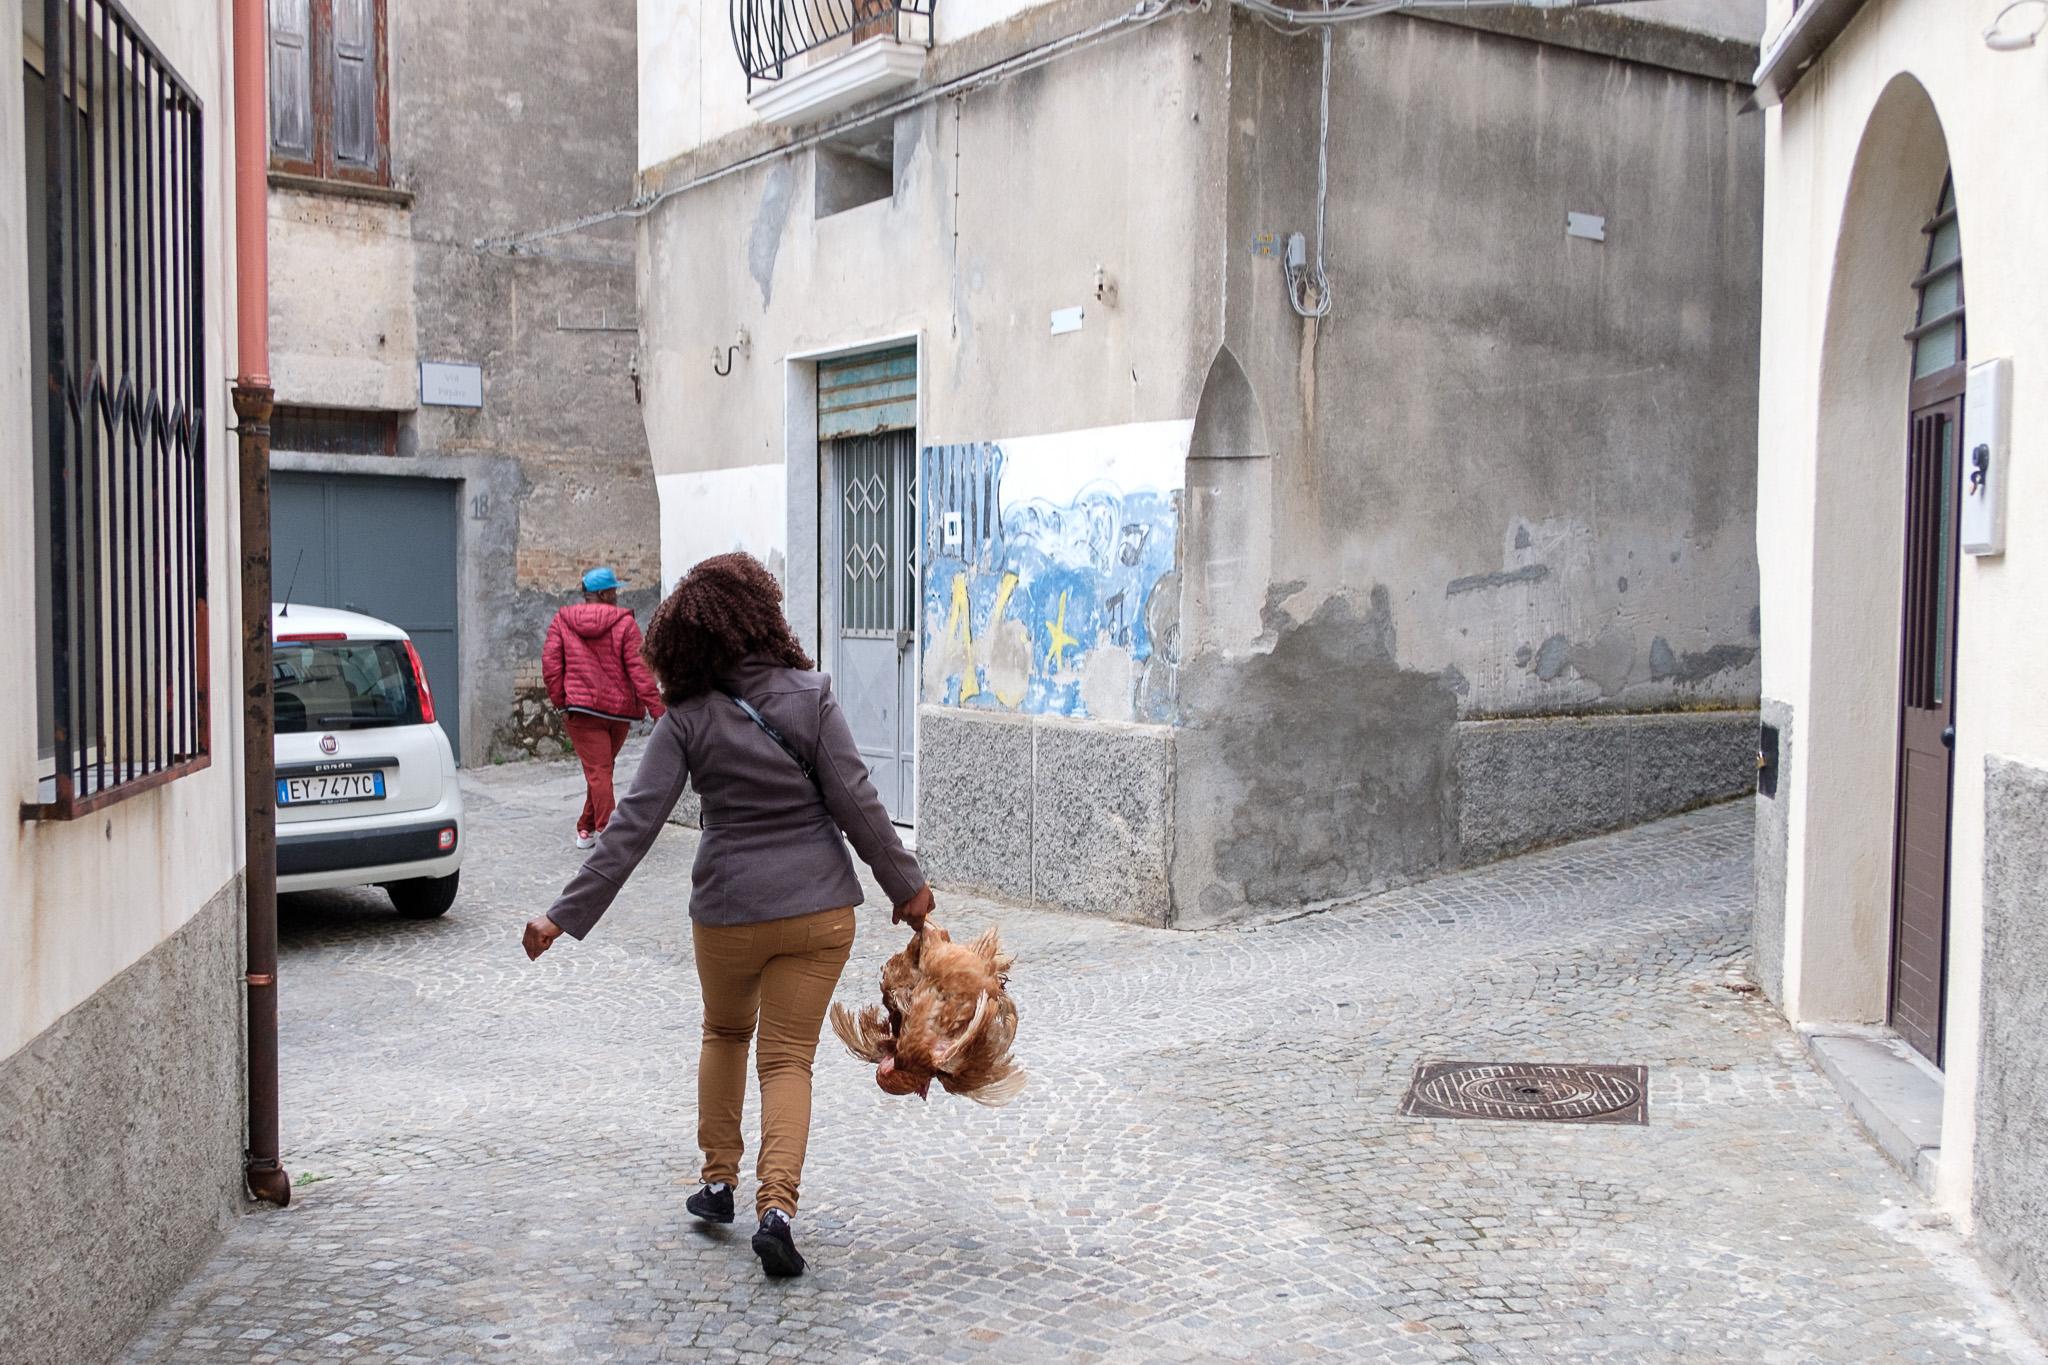 Riace-Calabria-Italy-300